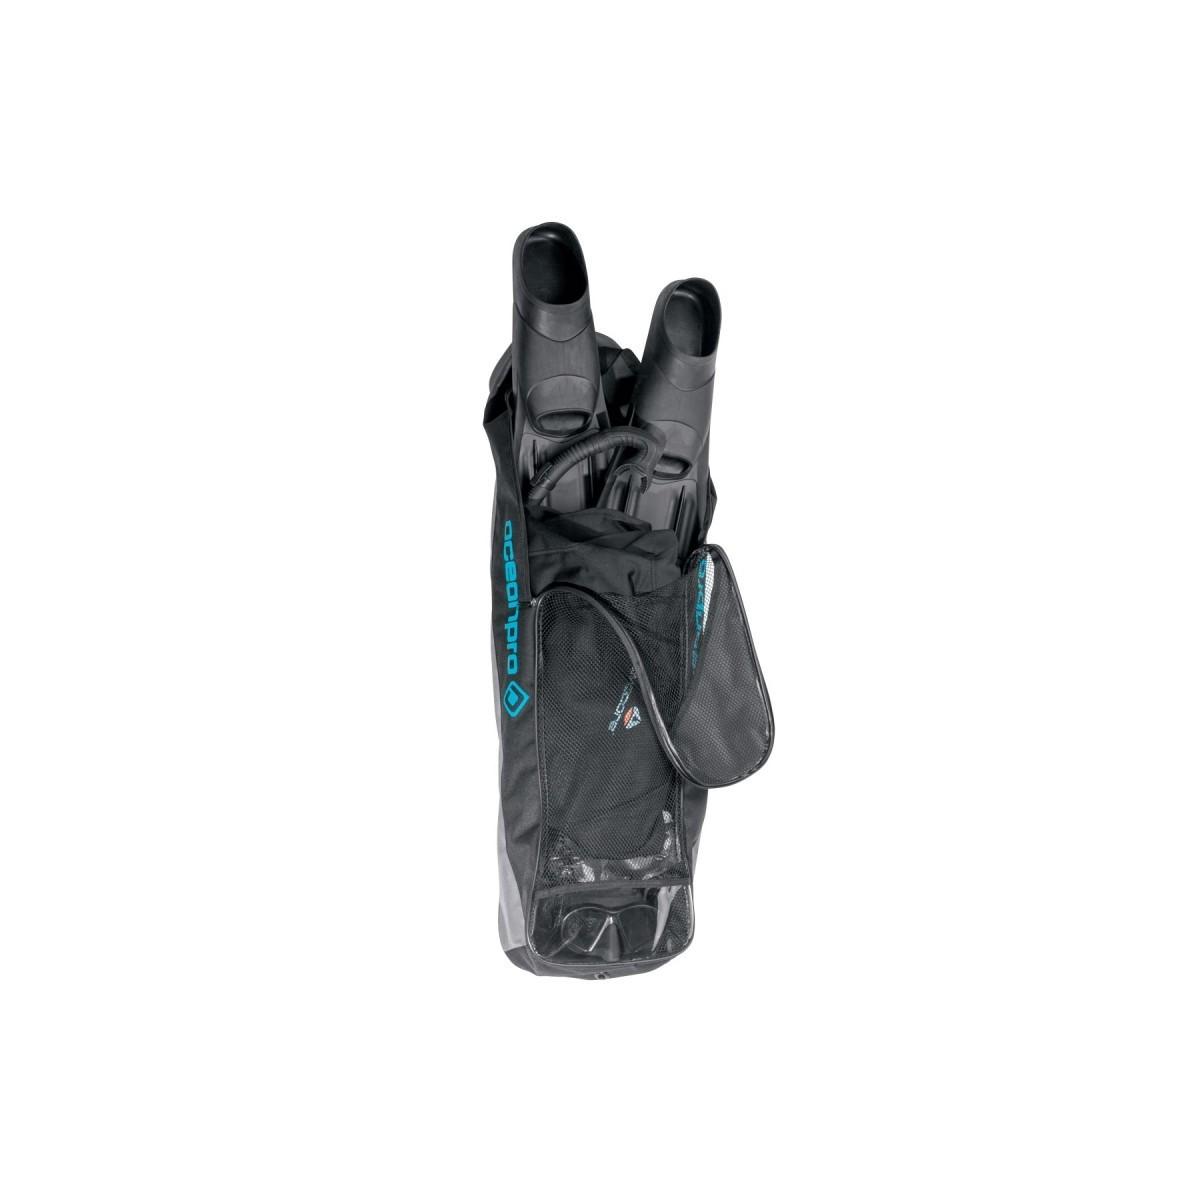 Oceanic Enzo Mask/Fin/Snorkel Bag